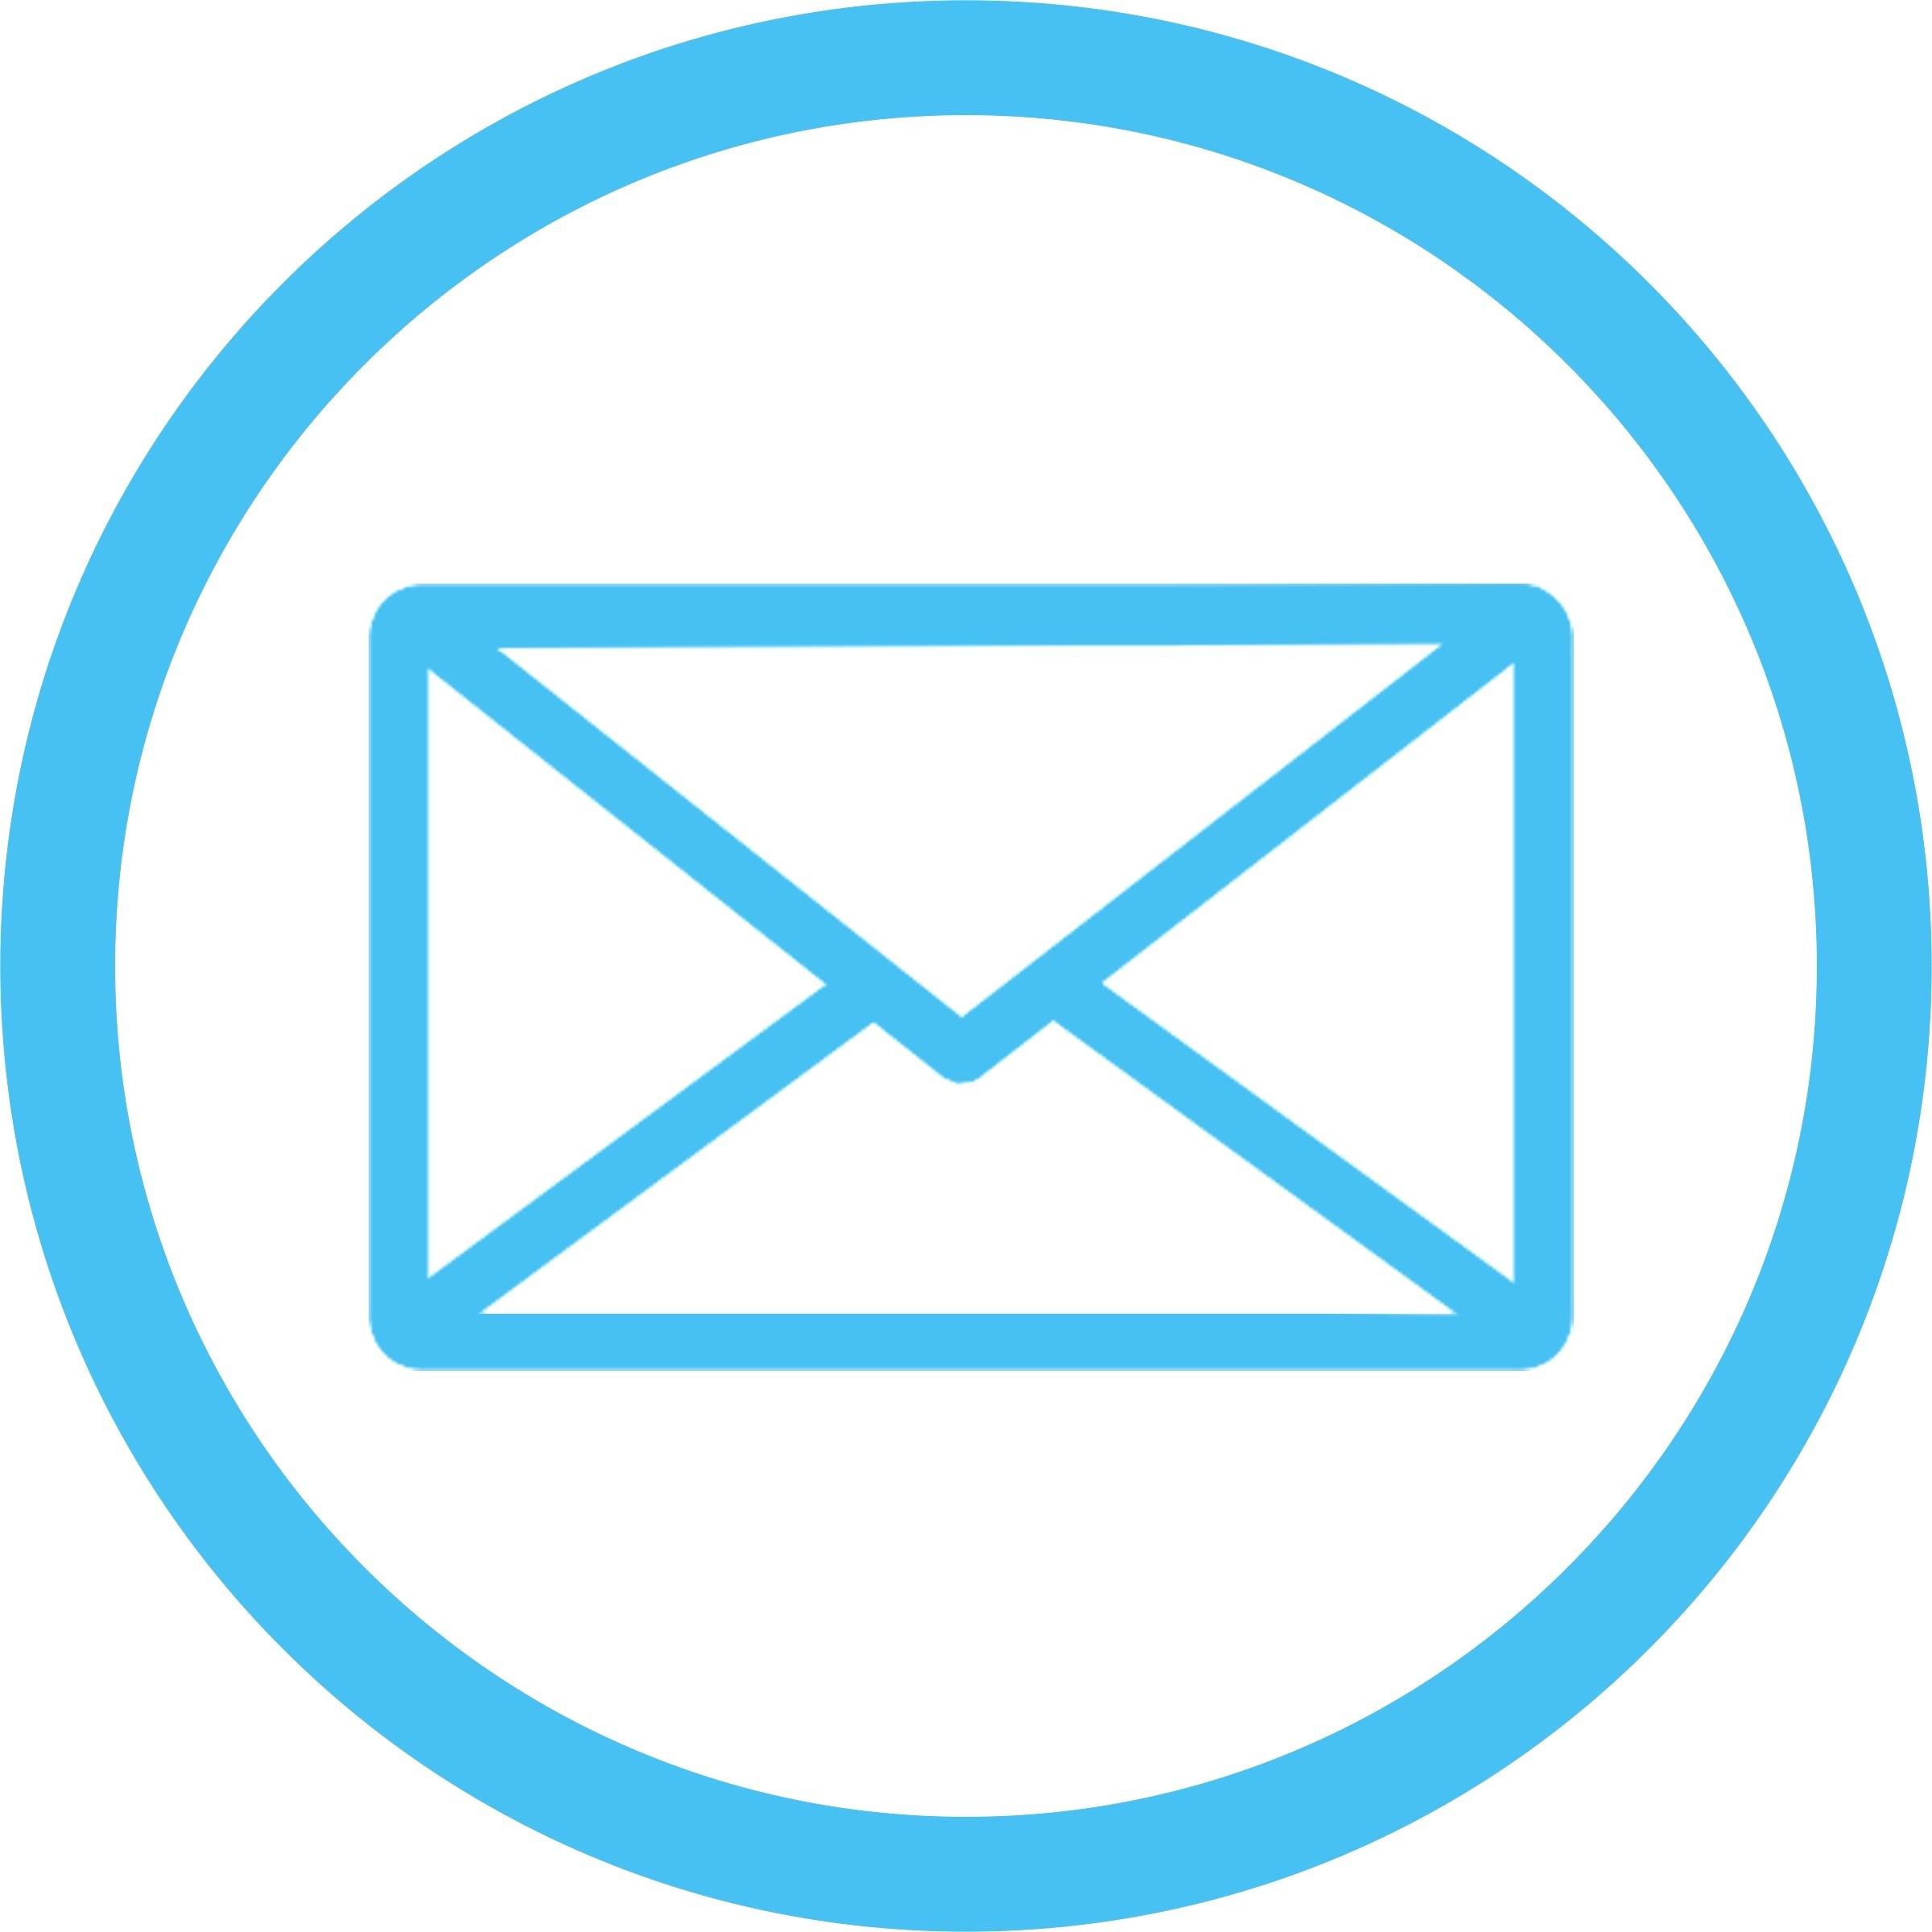 E mail clipart 5 » Clipart Portal.